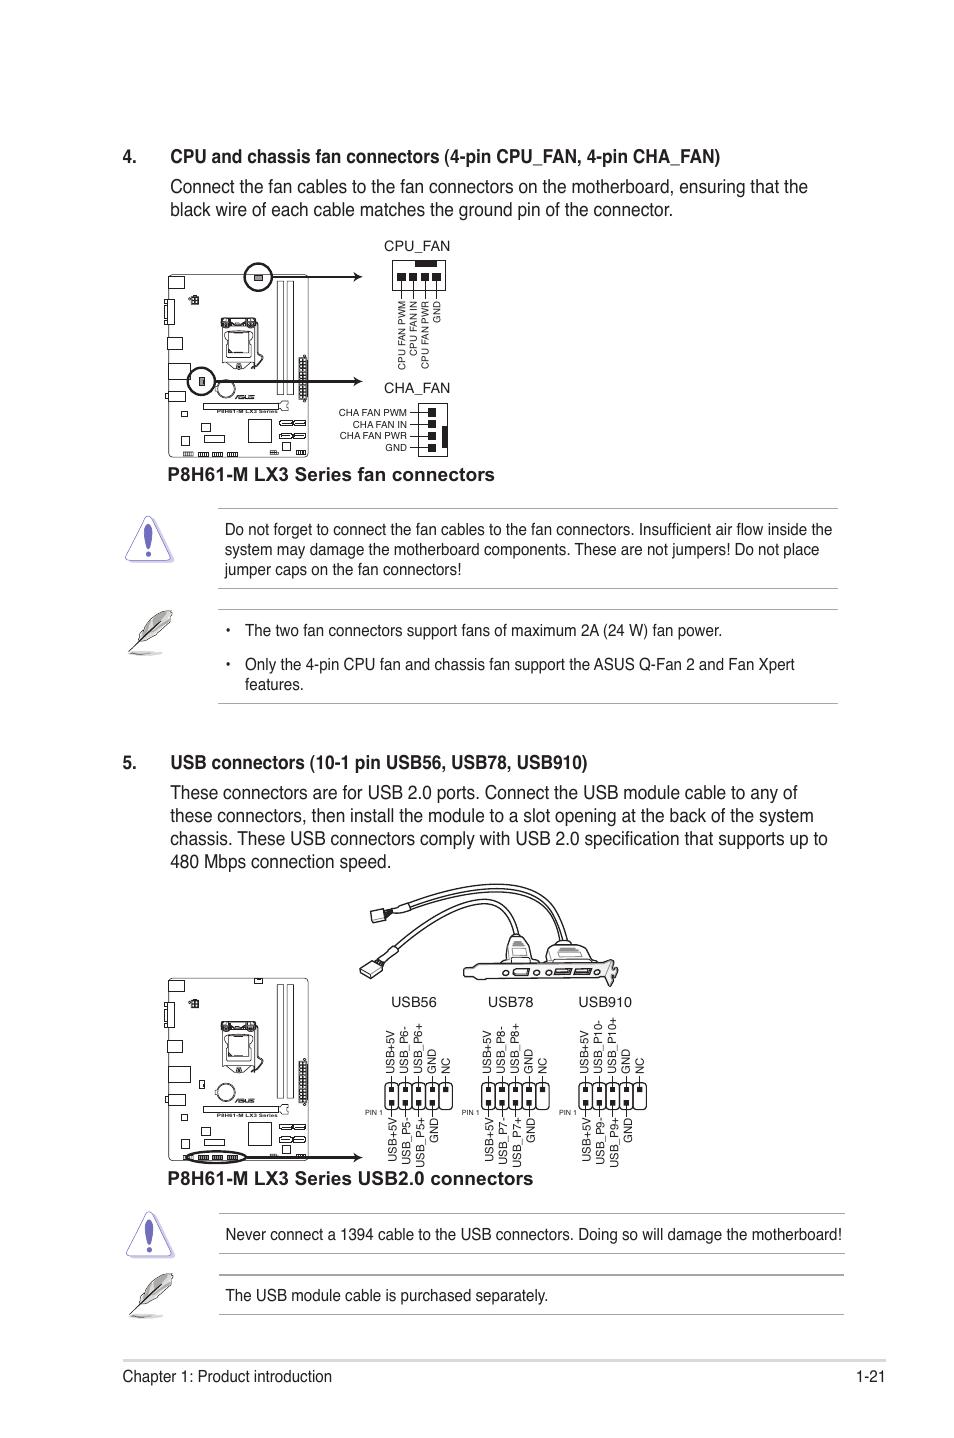 p8h61 m lx3 series fan connectors asus motherboard p8h61 m lx3 motherboard connection diagram p8h61 m lx3 series fan connectors asus motherboard p8h61 m lx3 series user manual page 31 65